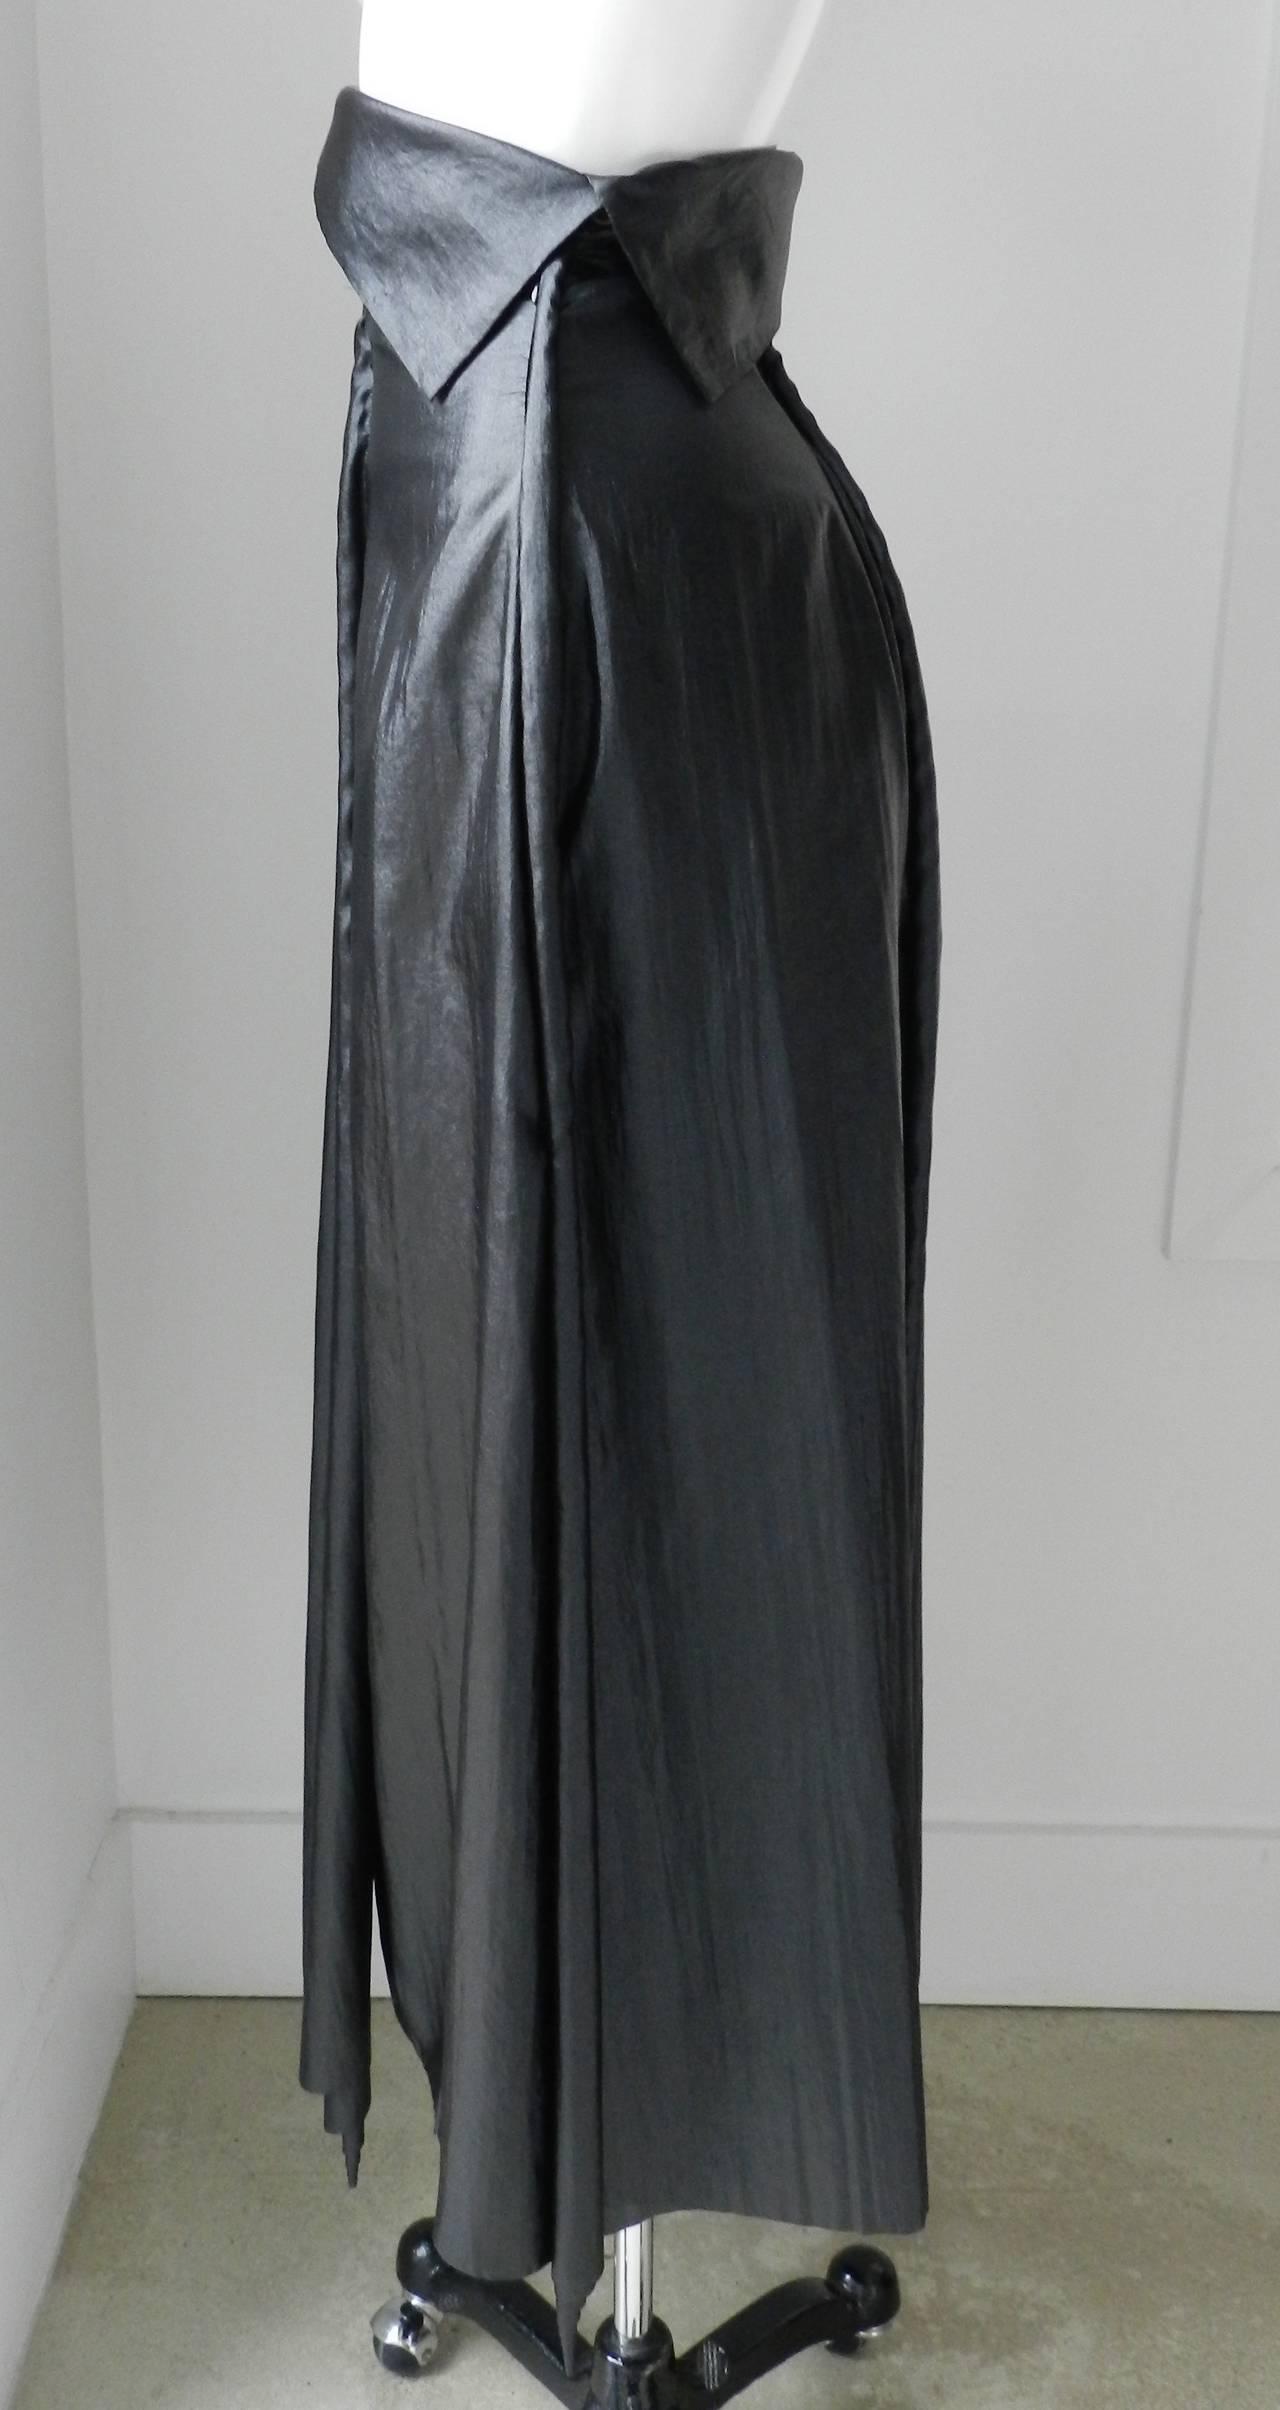 Black Shiny Skirt 39